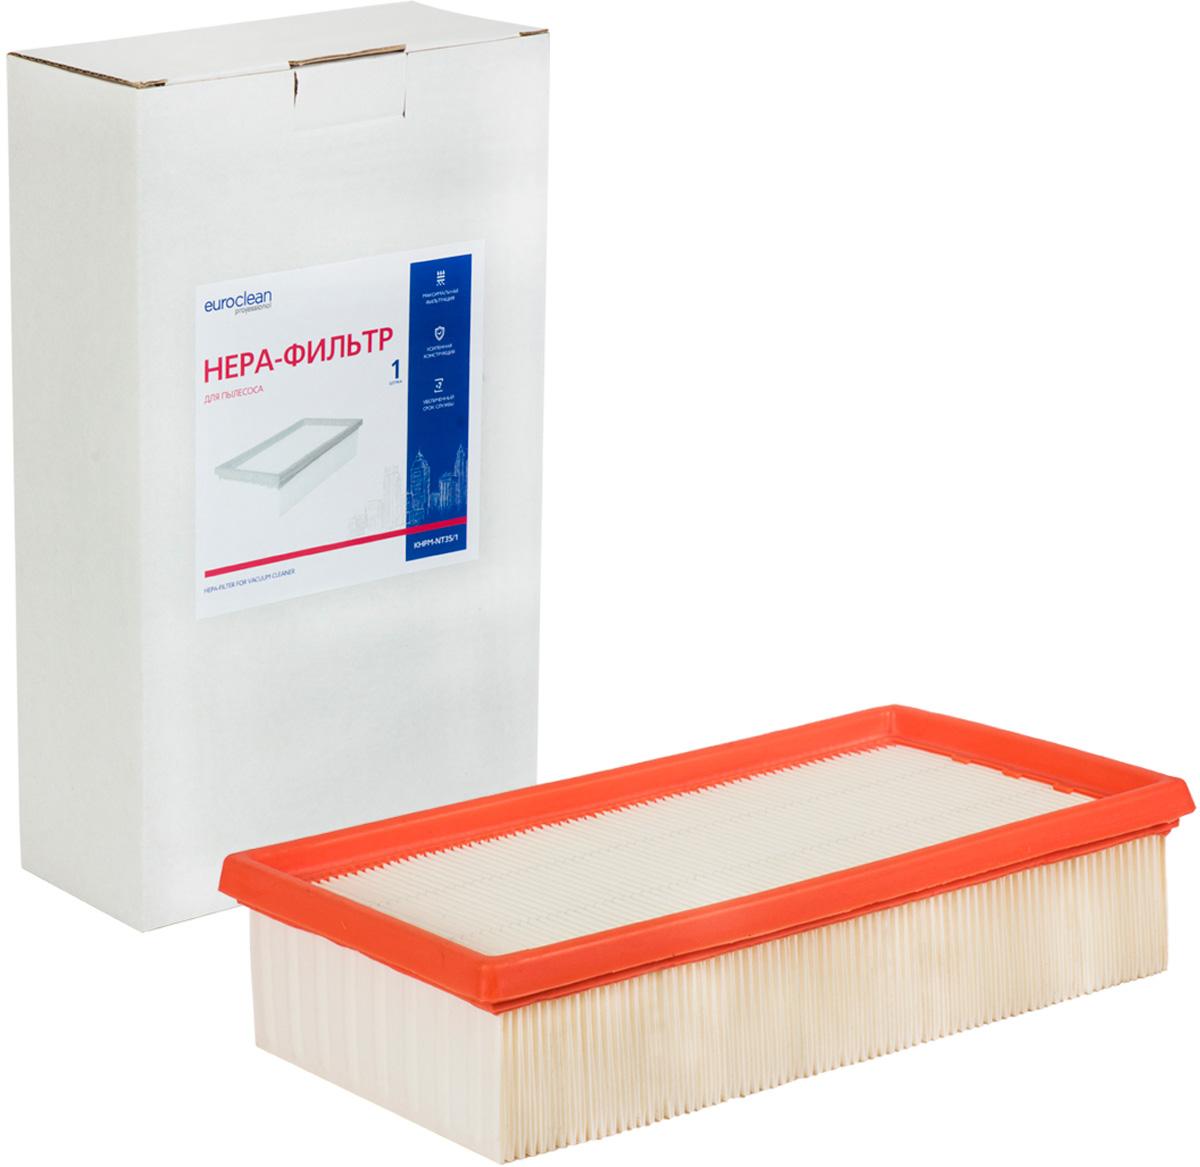 Euroclean KHPM-NT35/1 фильтр складчатый для сухой пыли к пылесосам KARCHER (аналого 6.904-367.0) euroclean flsm as20 фильтр складчатый многоразовый моющийся для пылесосов felisatti as20 1200